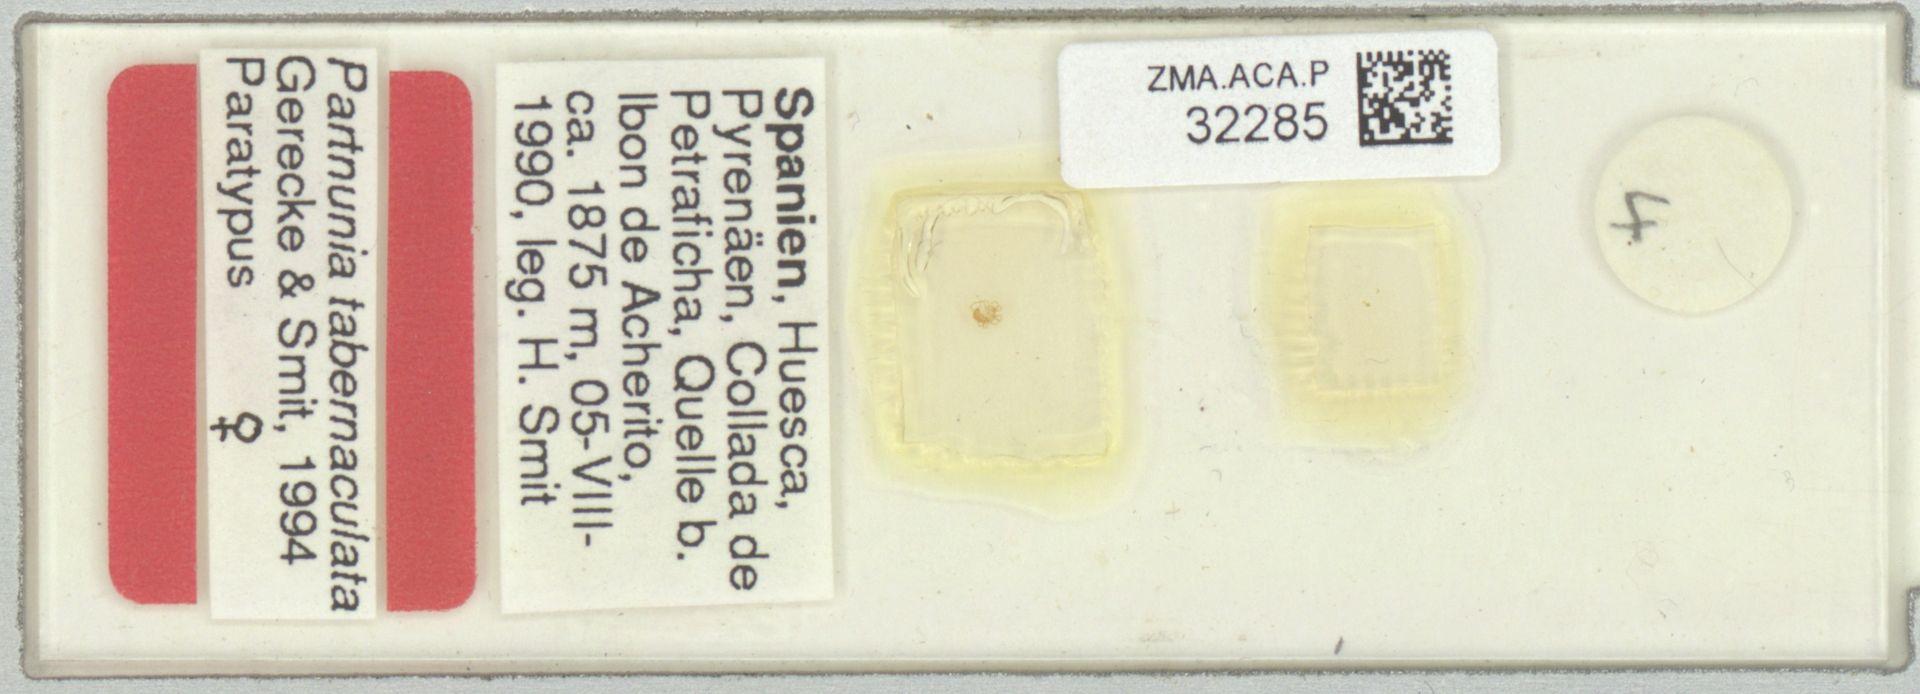 ZMA.ACA.P.32285 | Partnunia tabernaculata Gerecke & Smit, 1994